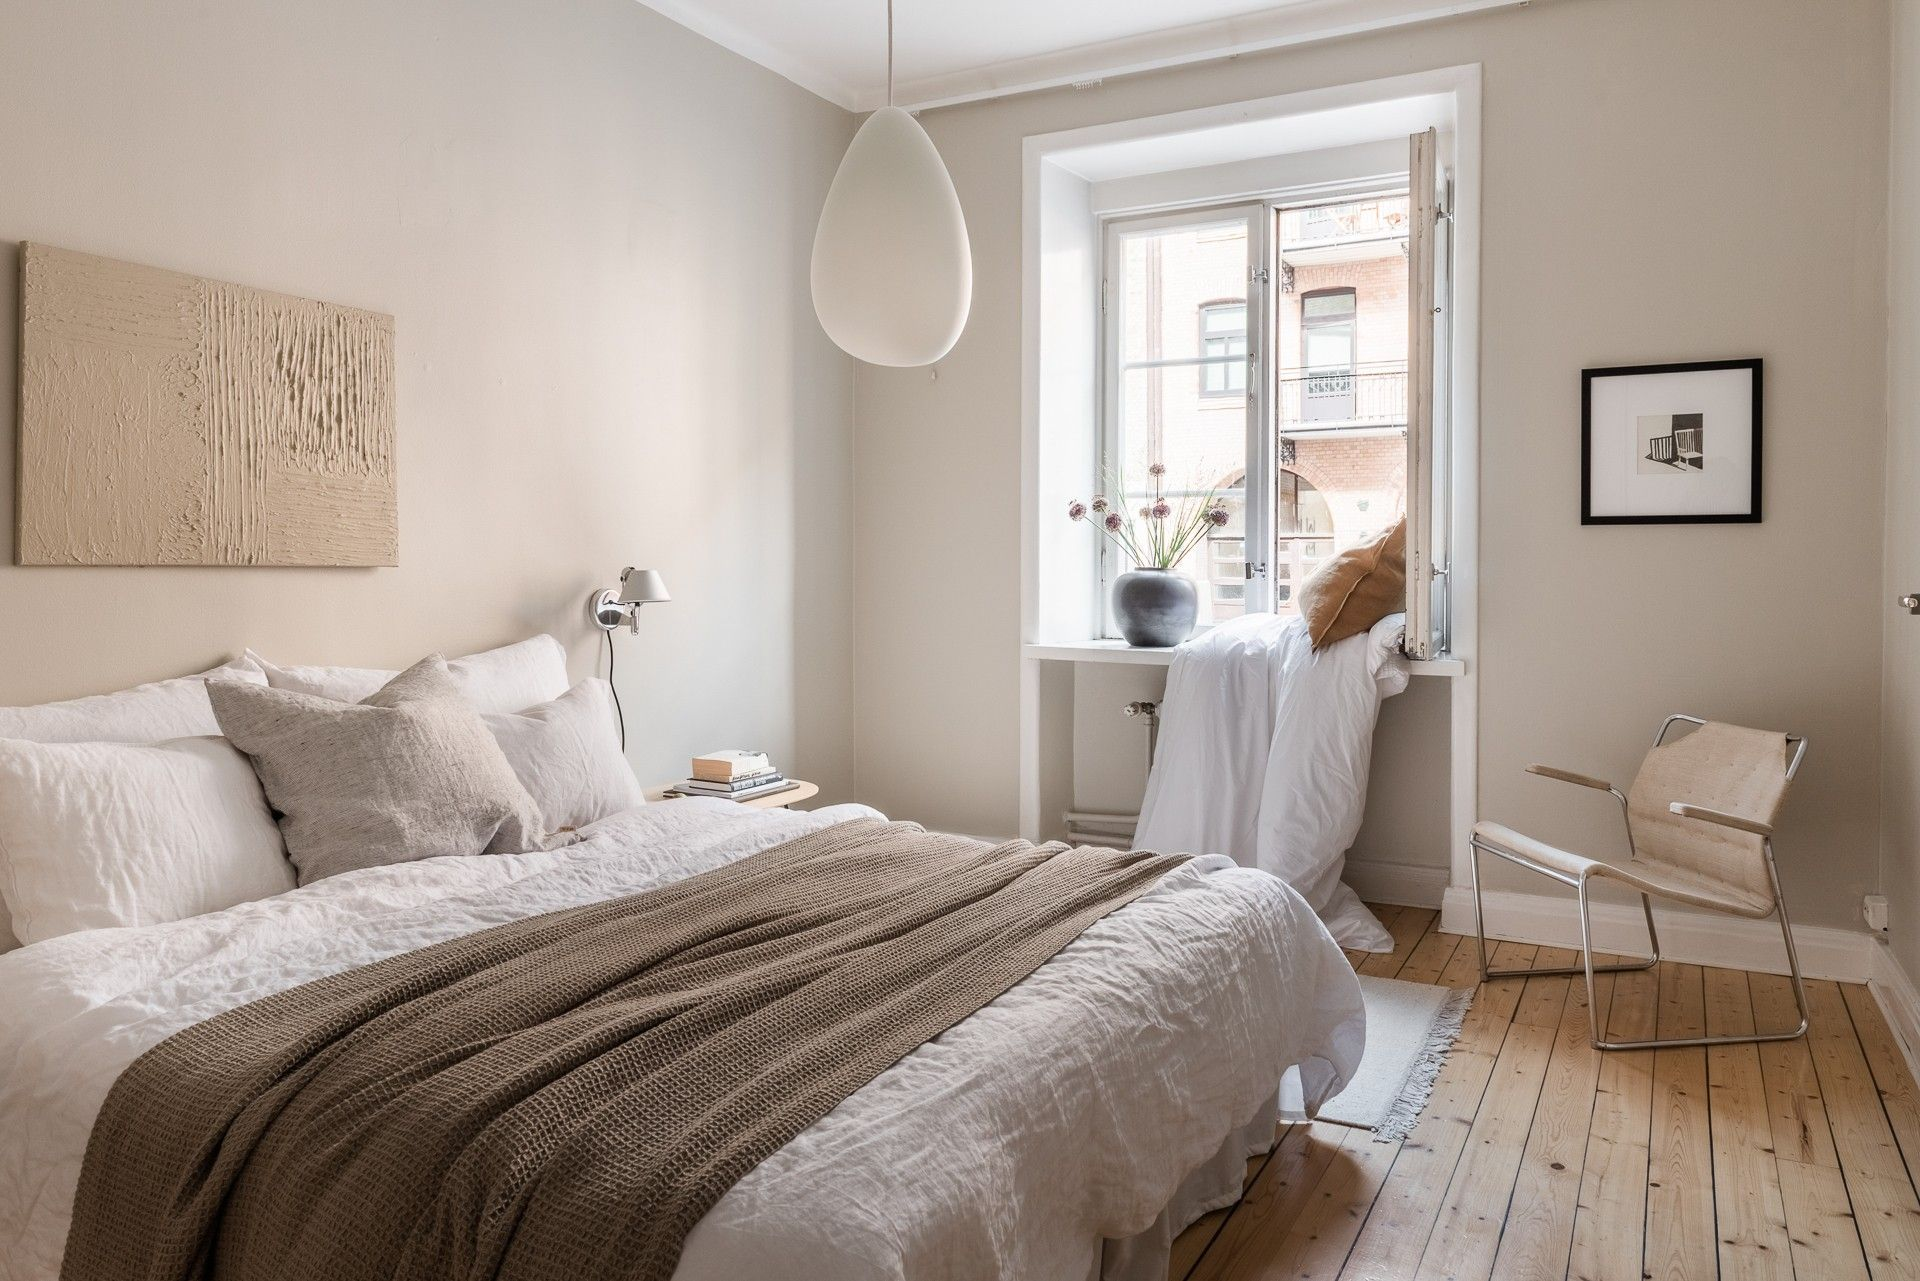 light pink scandinavian bedroom design with light floorboards and white bedding